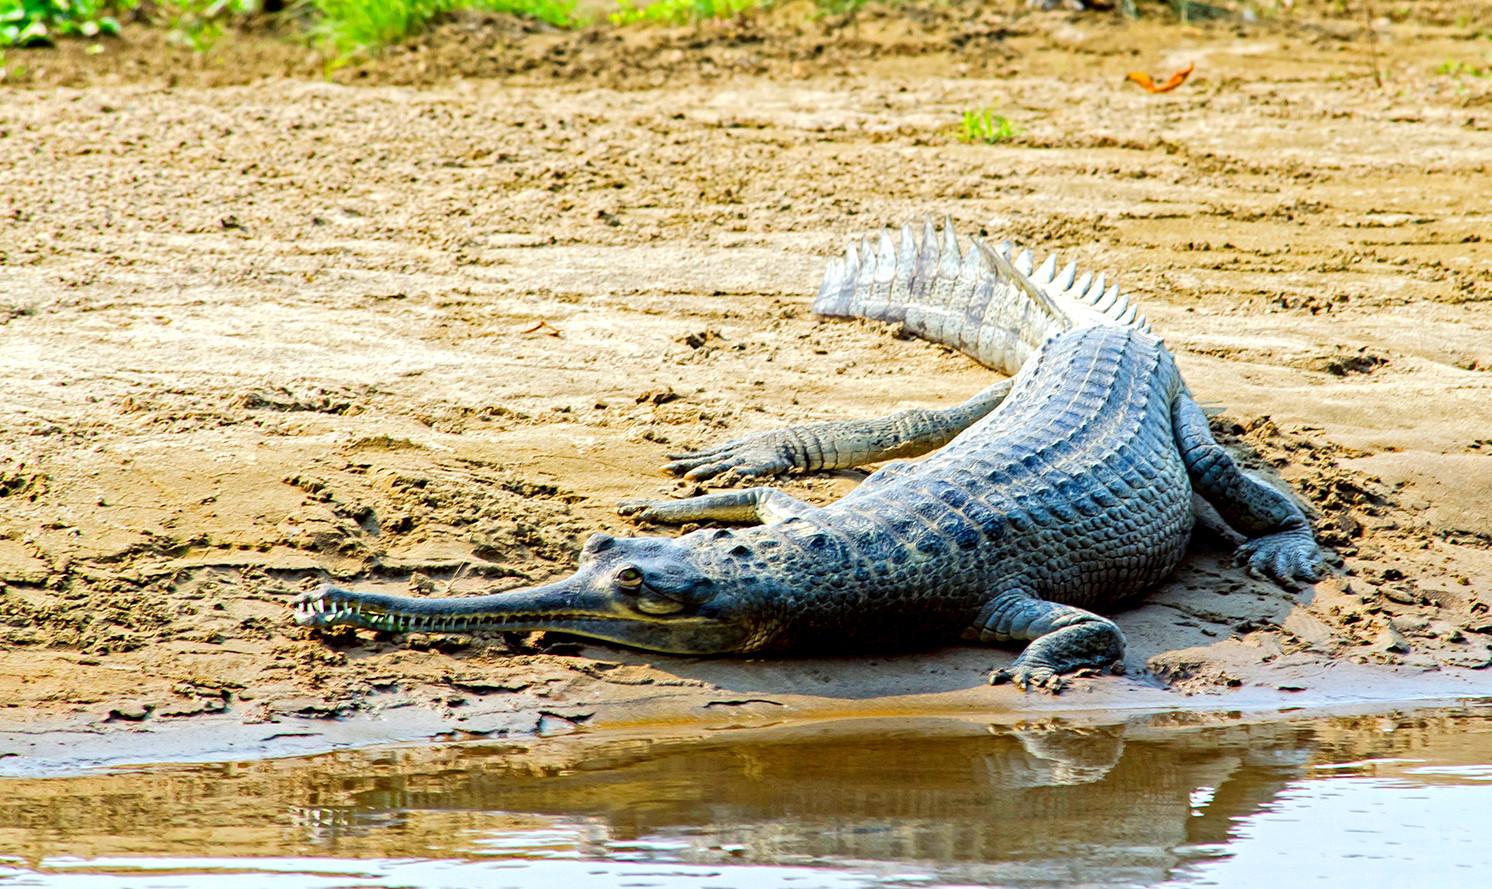 Gharial Image Credits: blog.nepaladvisor.com